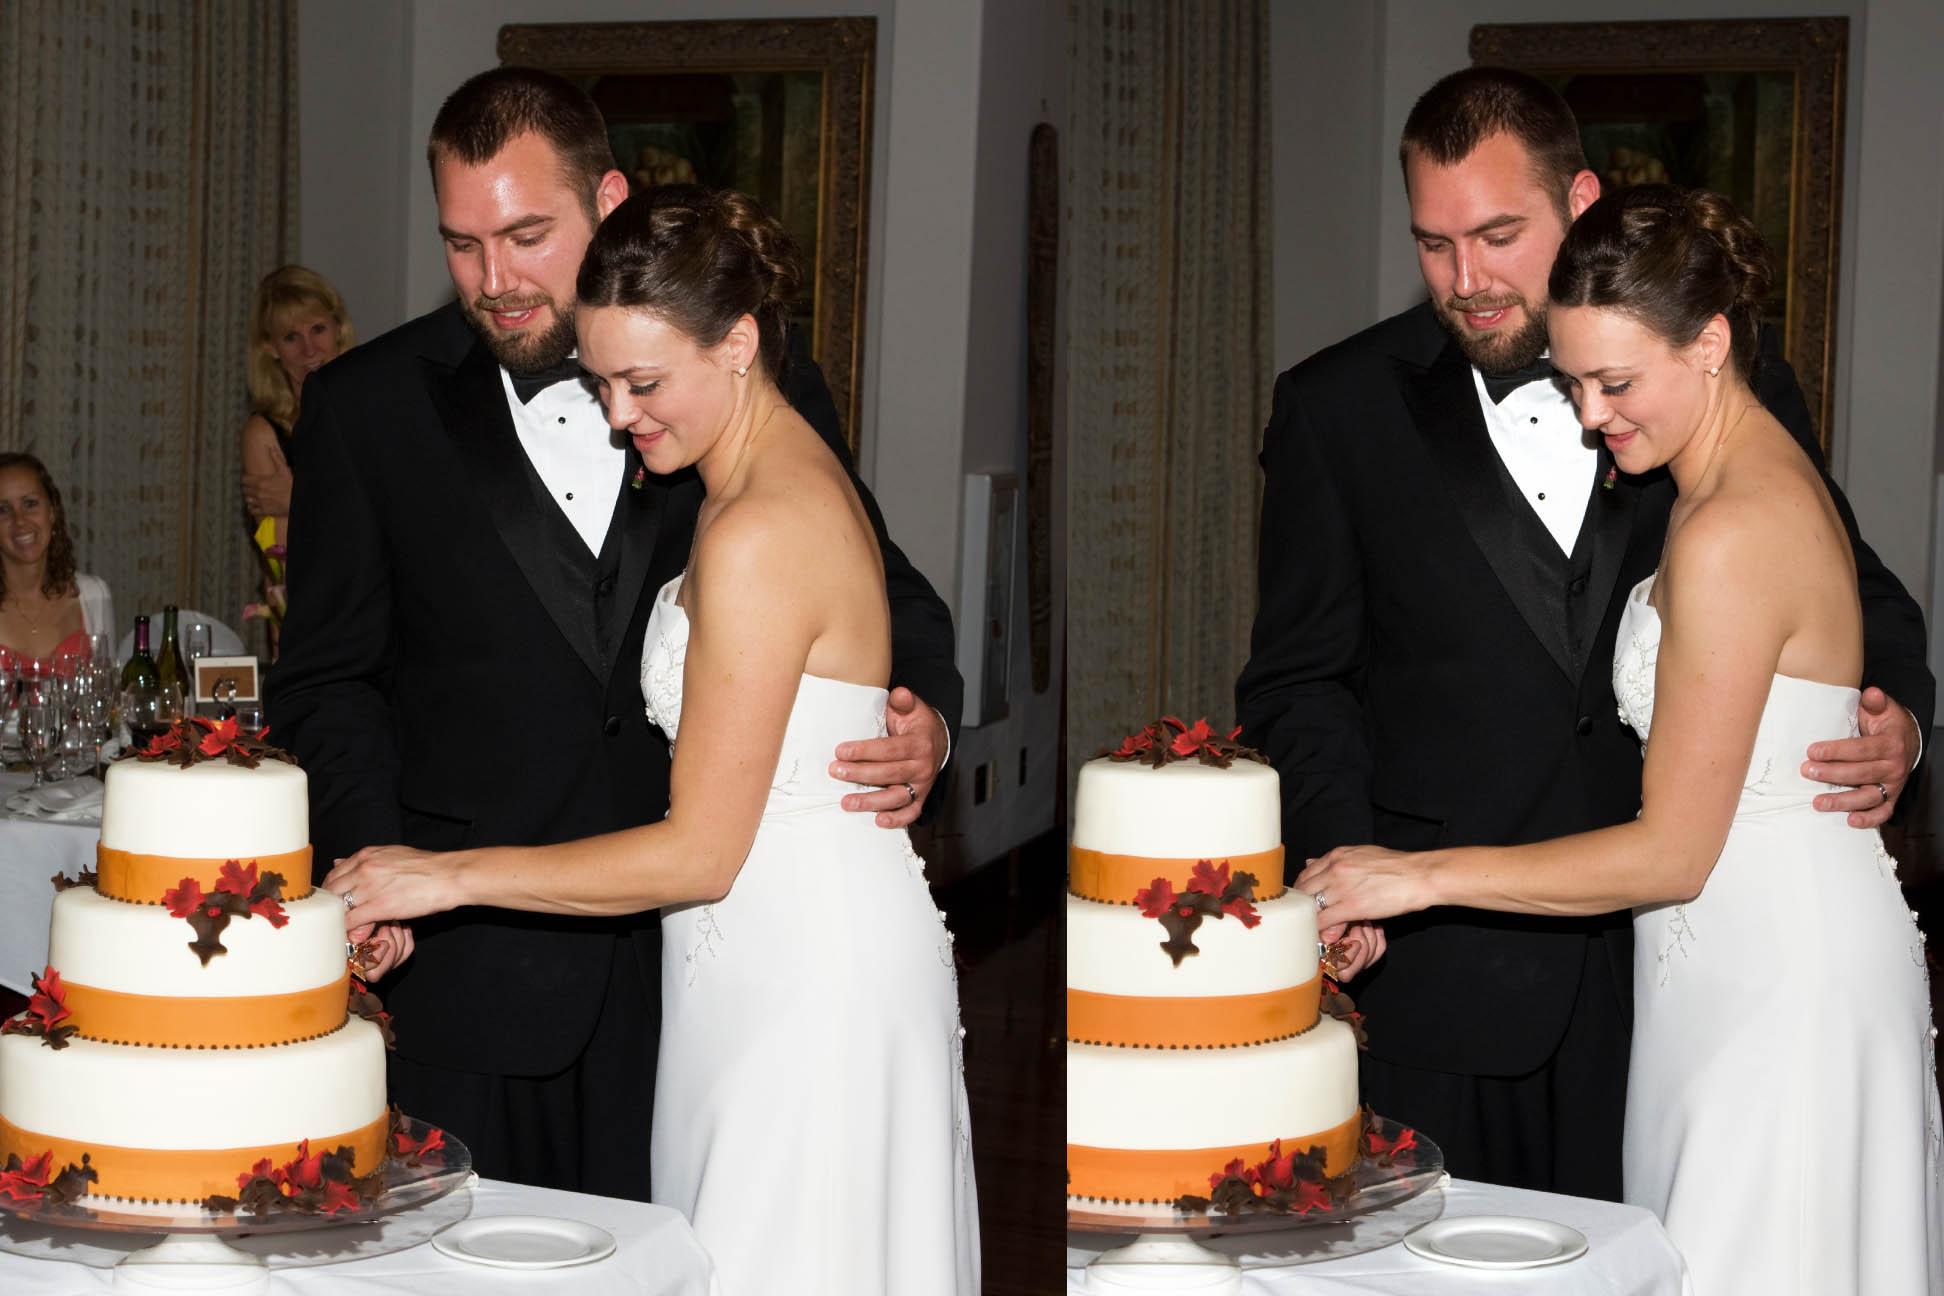 digital retouching of wedding photos